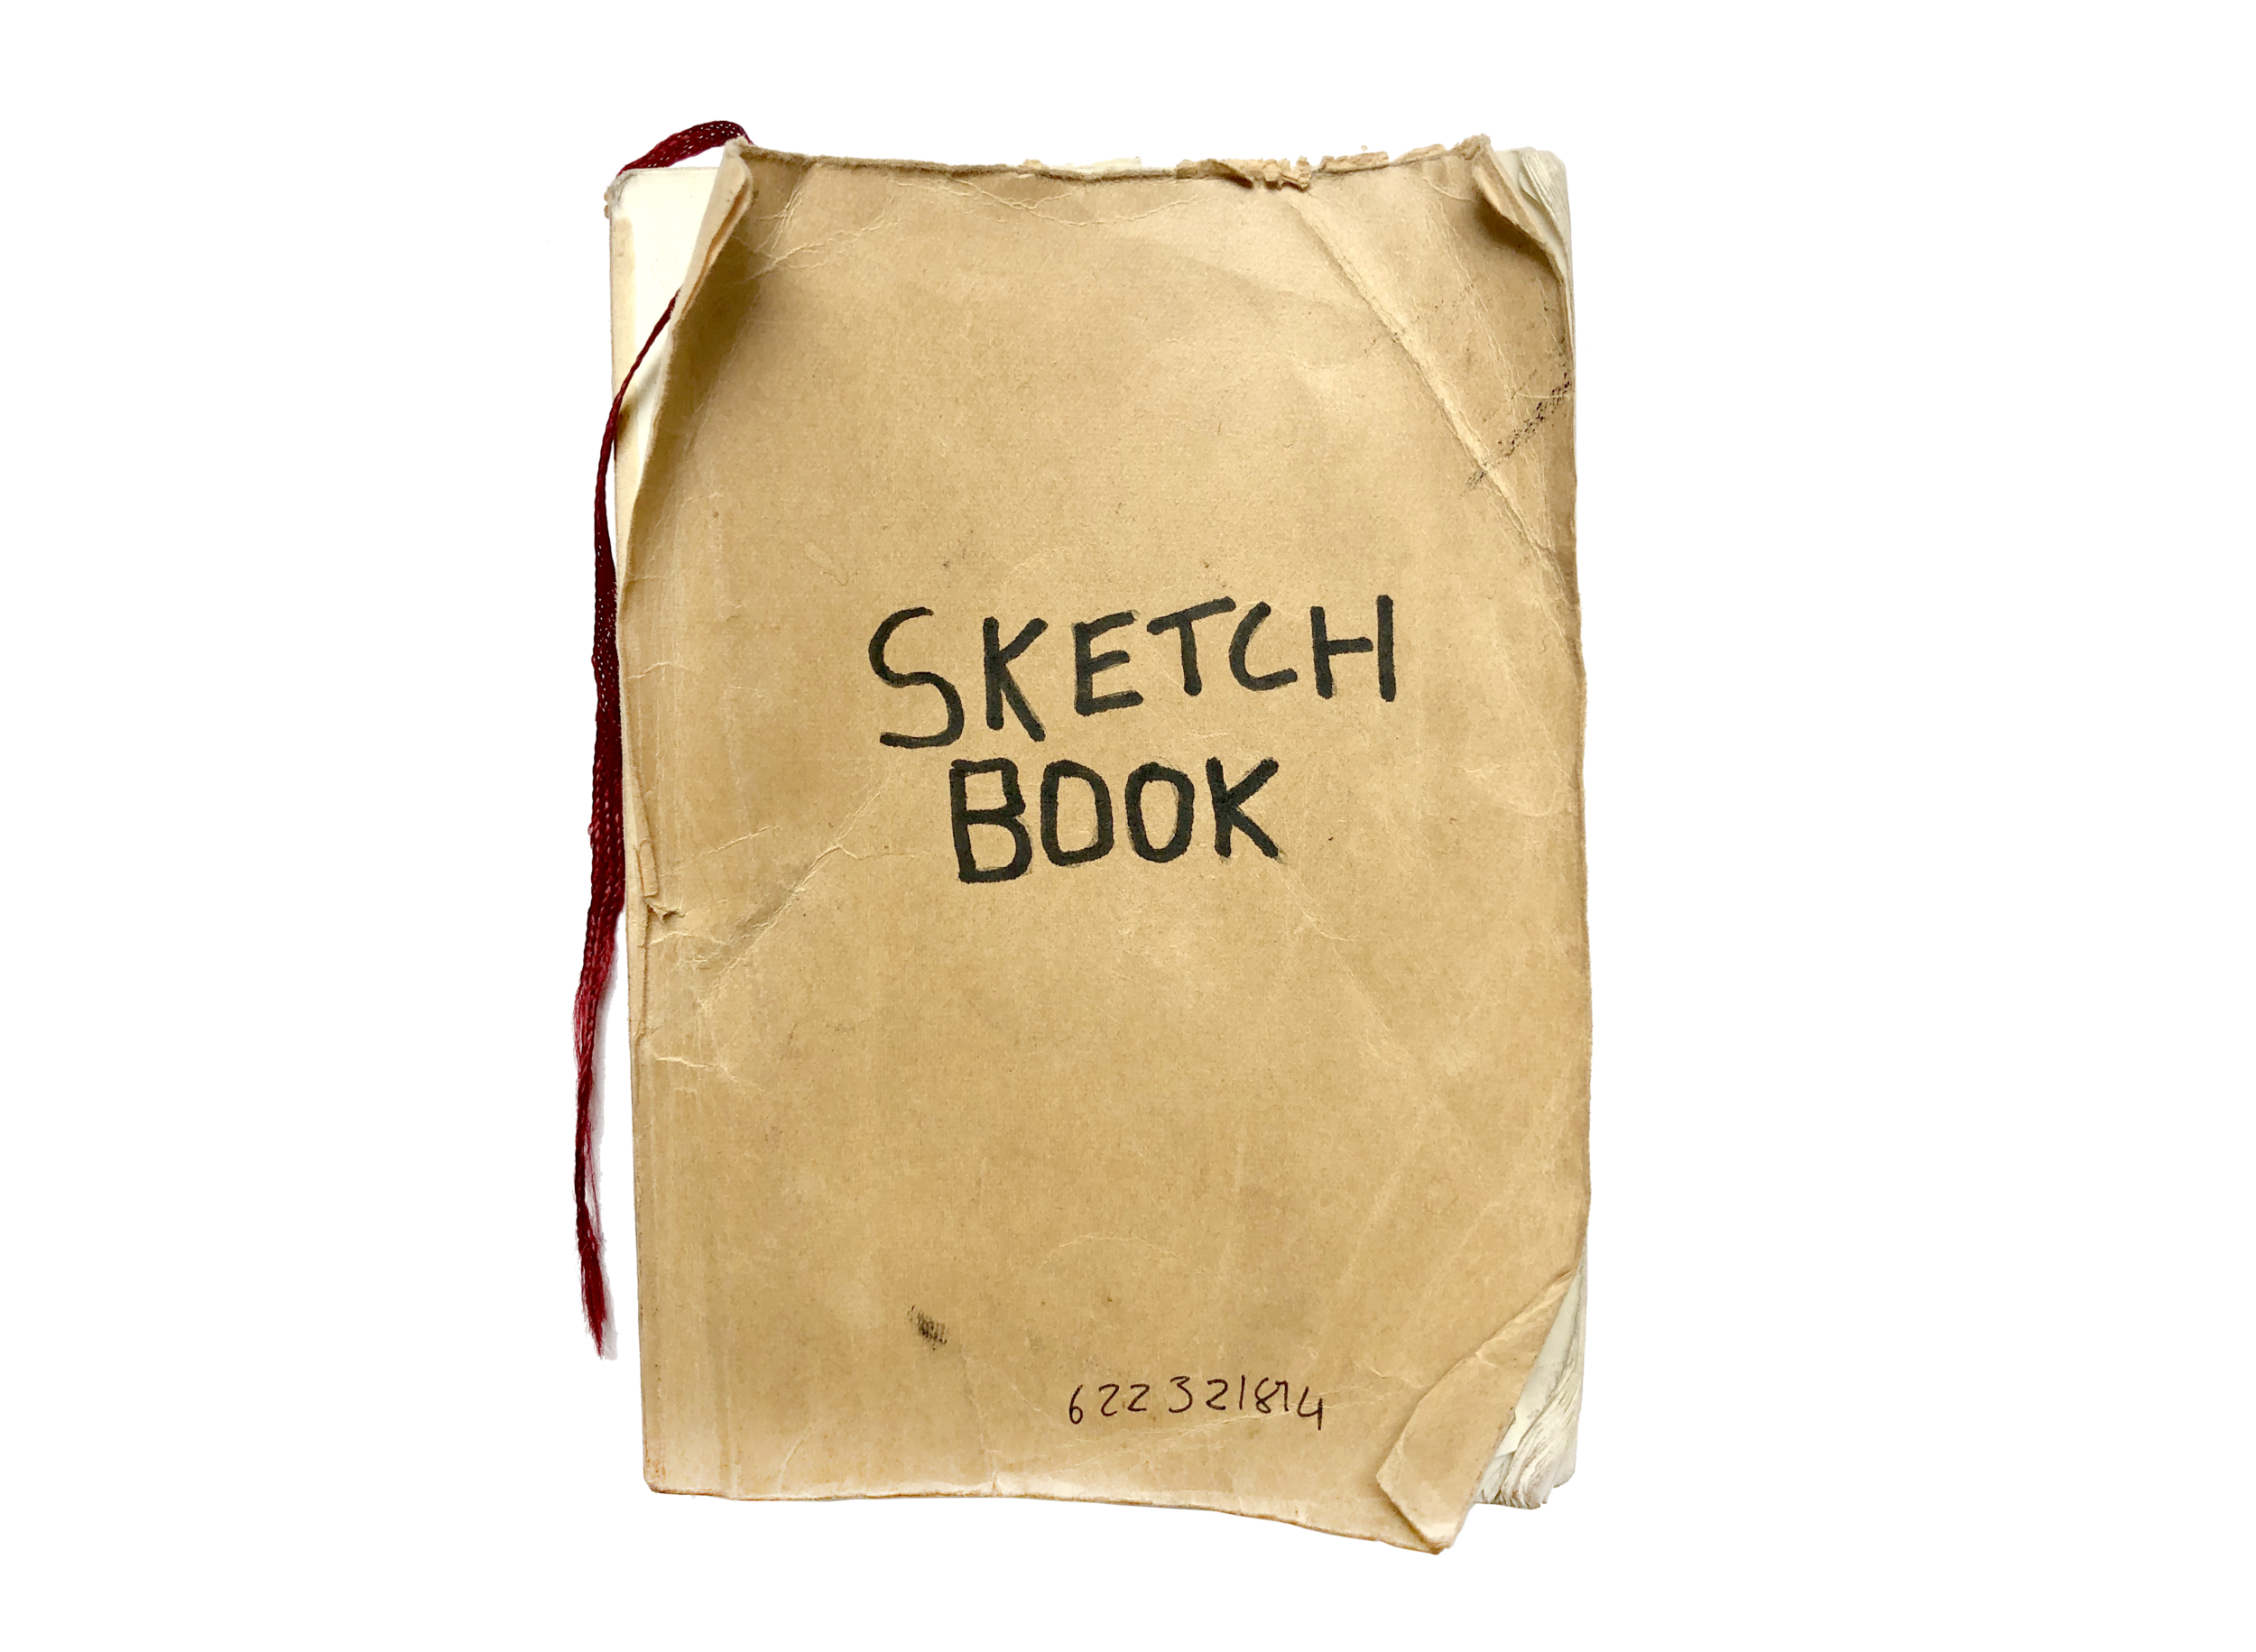 sketch book image.png